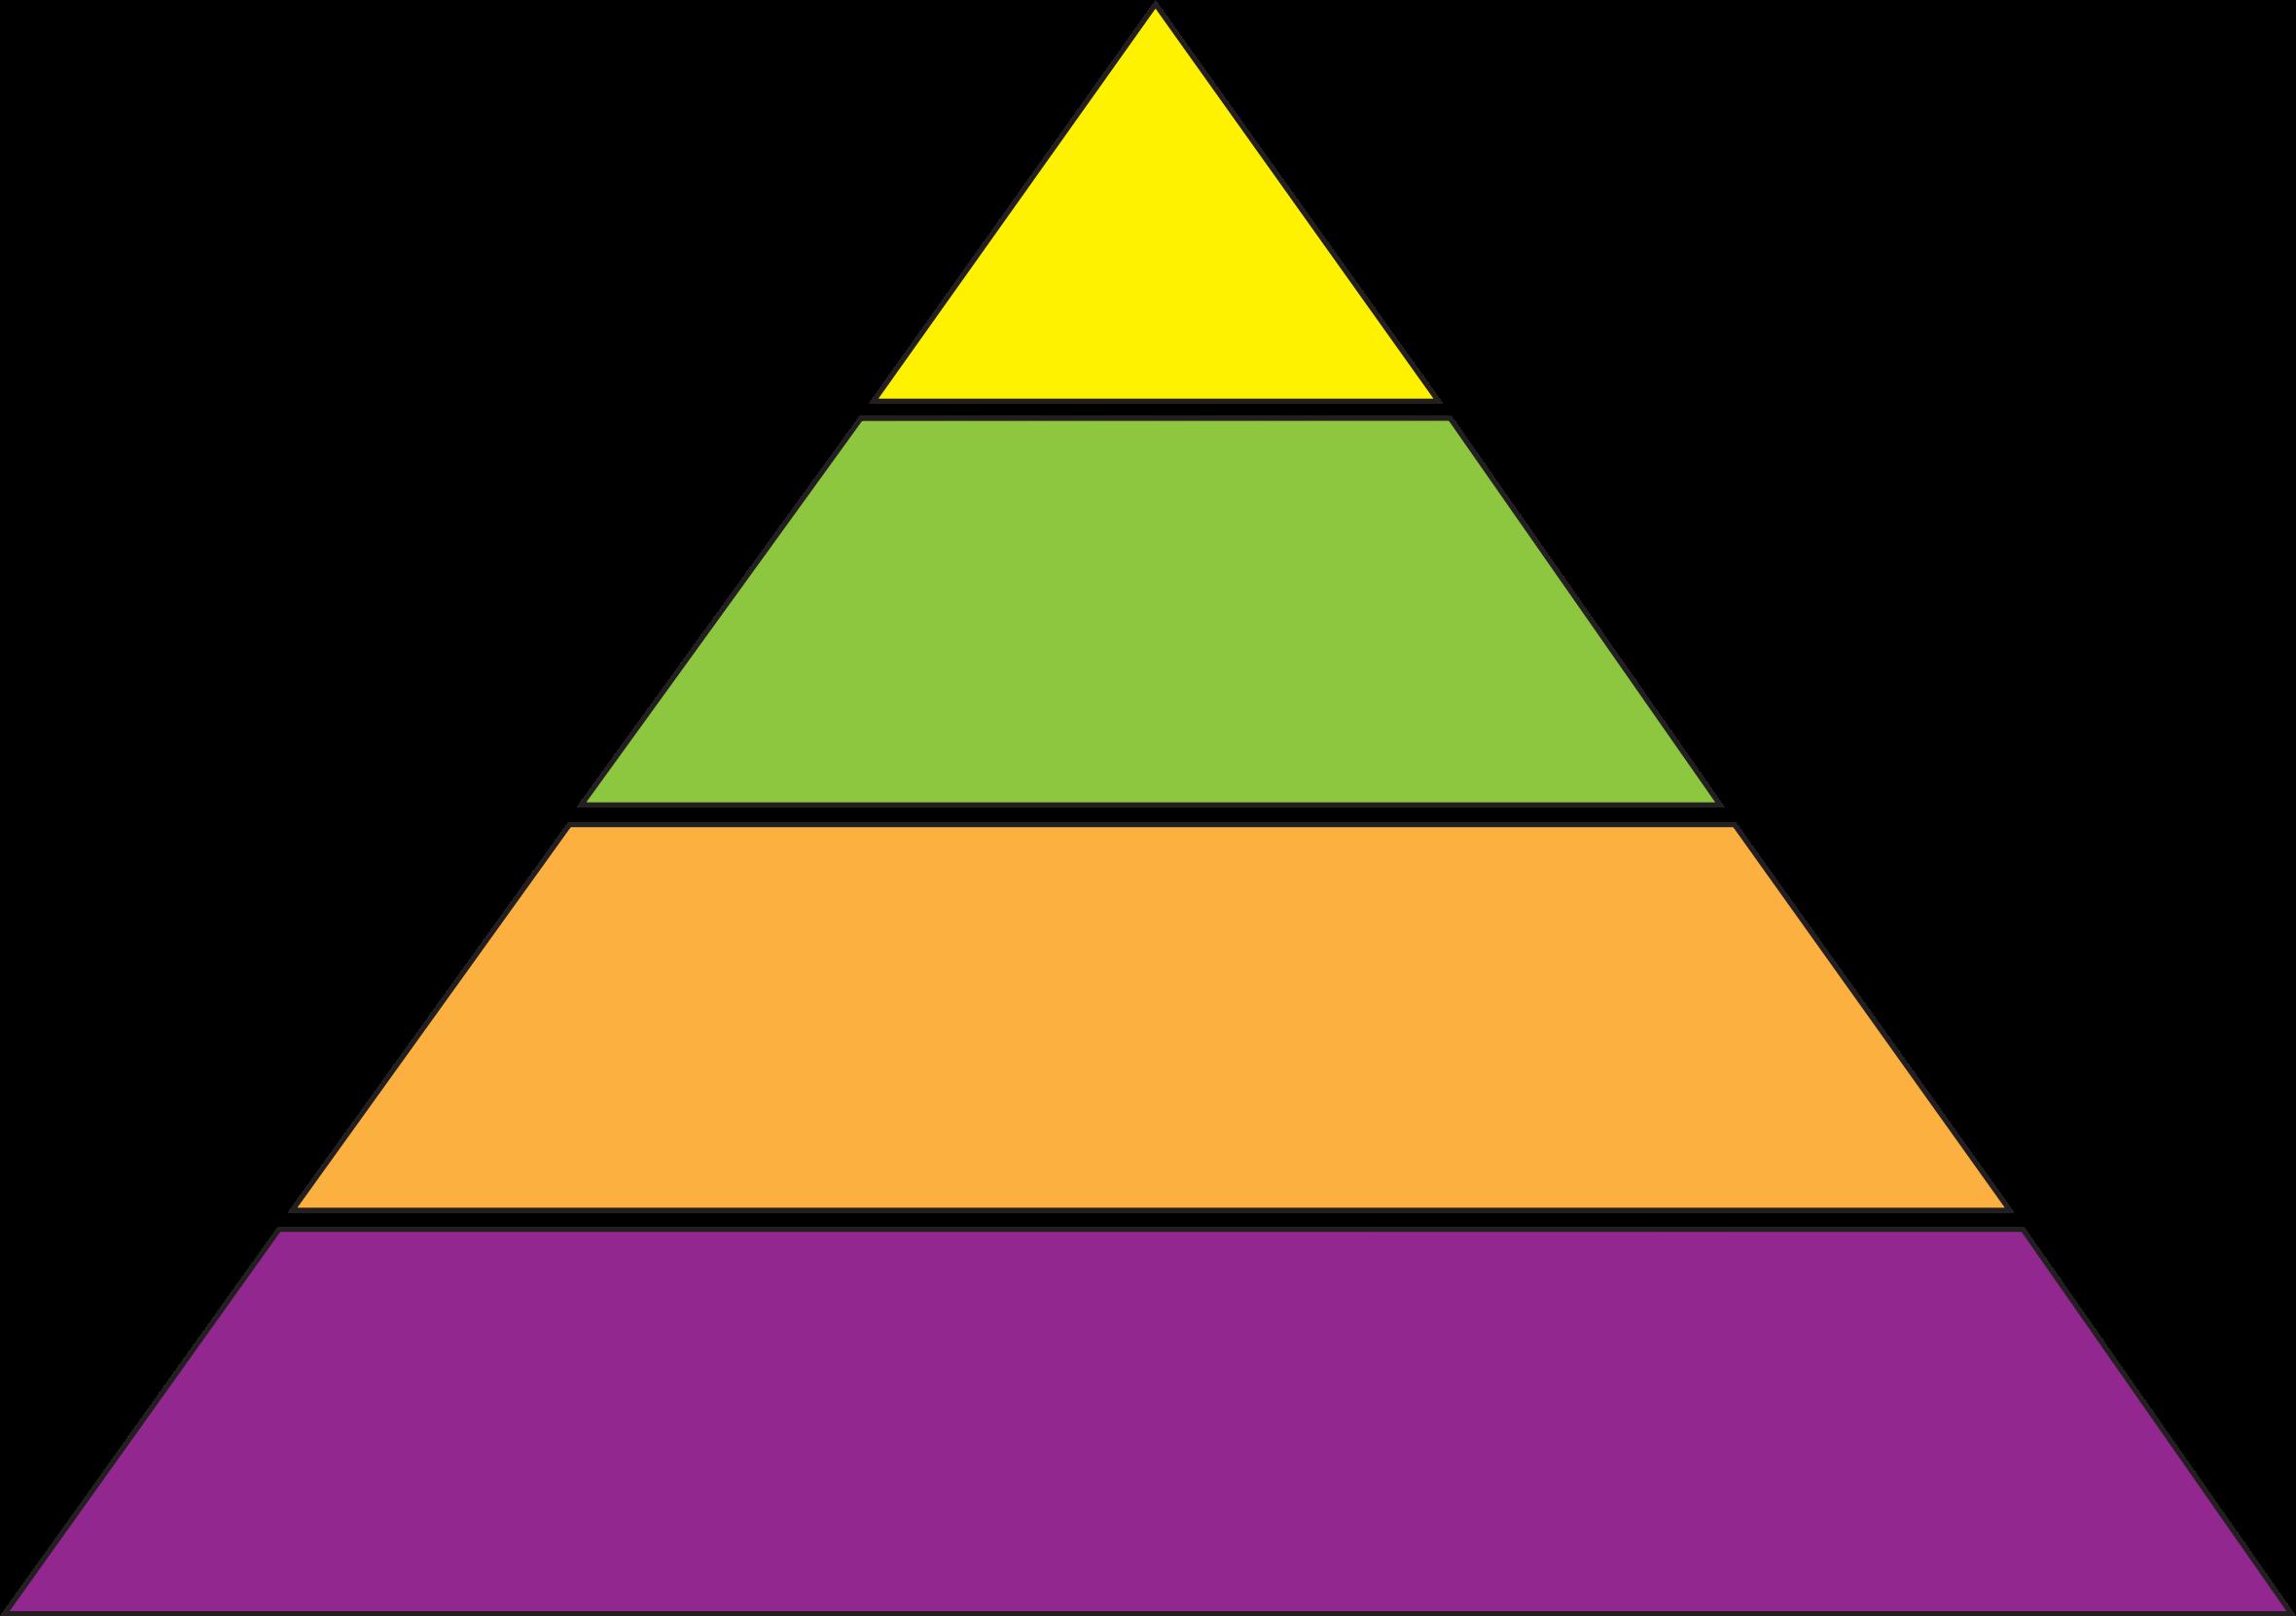 Free Transparent Pyramid, Download Free Clip Art, Free Clip.